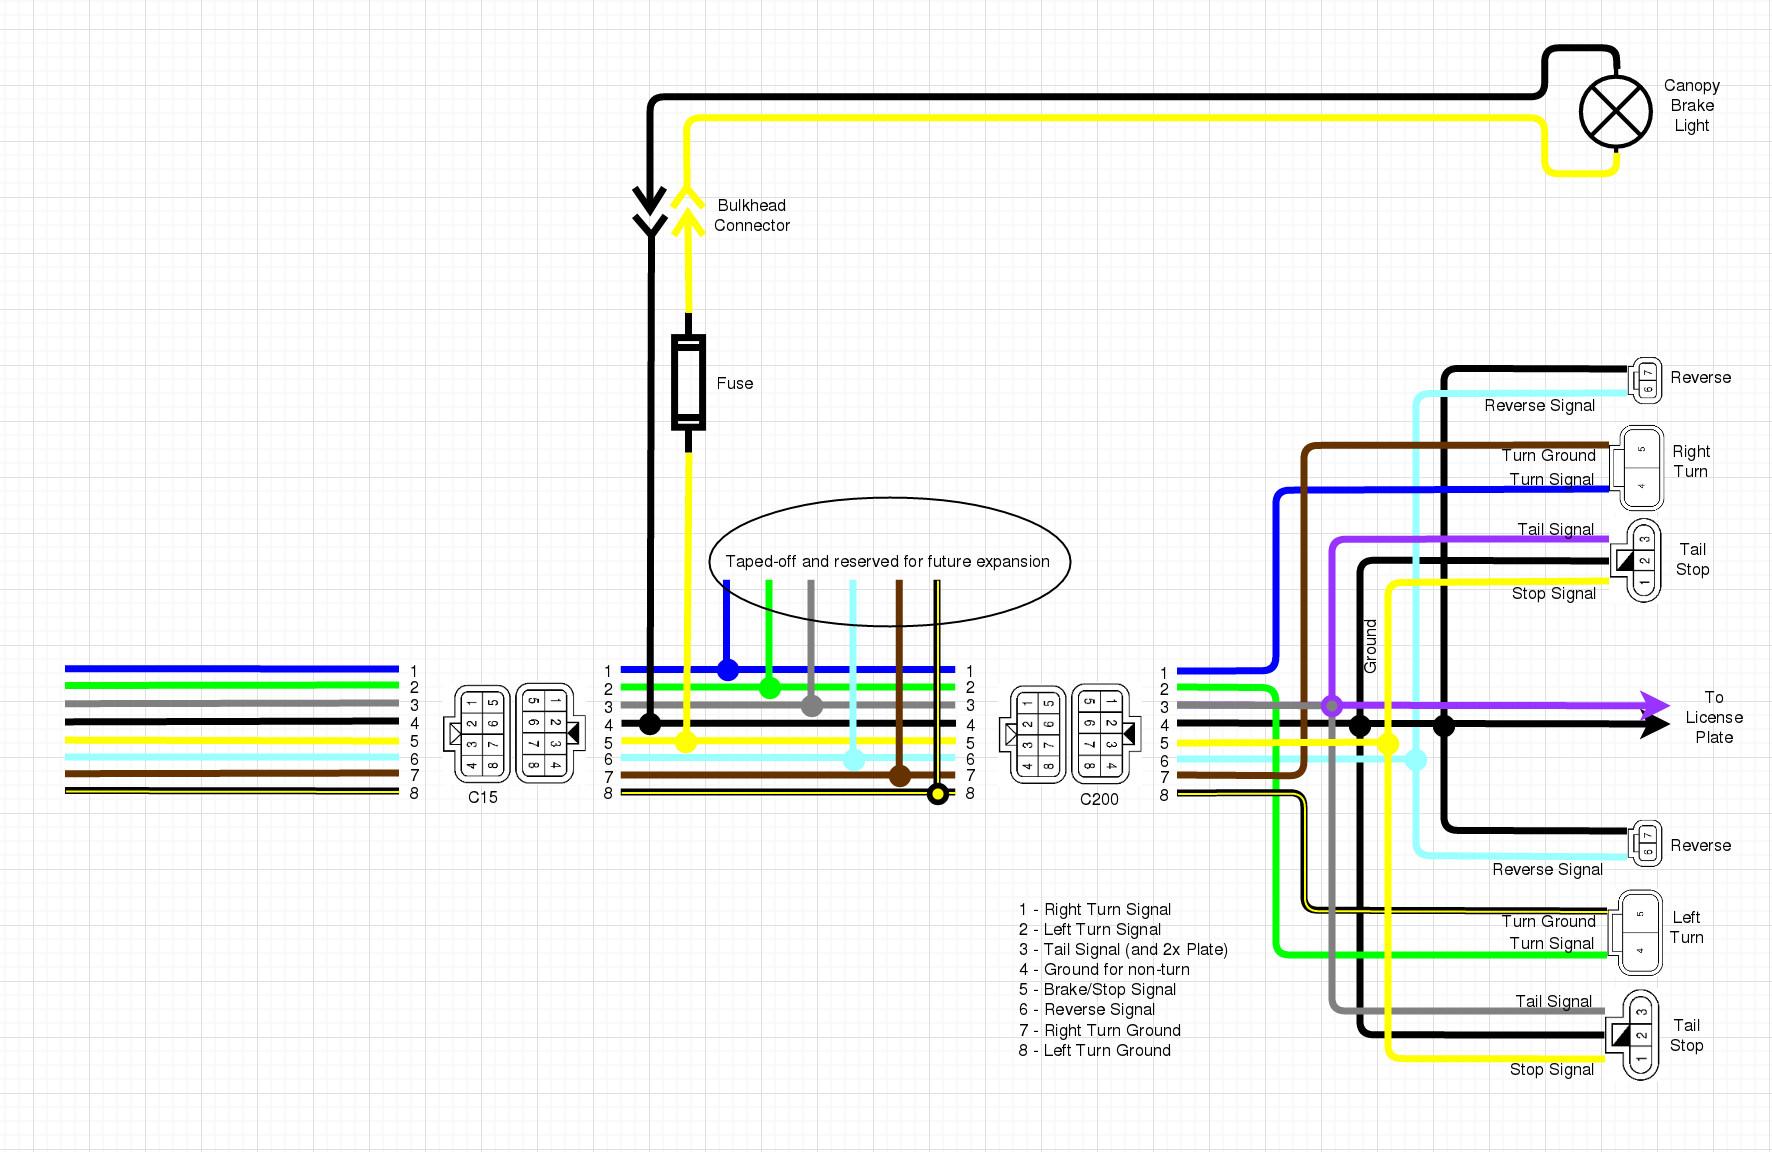 Ae86 Brake Light Wiring Diagram - 2003 Chevy Duramax Fuel Filter Housing -  loader.furnaces.jeanjaures37.fr | Ae86 Brake Light Wiring Diagram |  | Wiring Diagram Resource